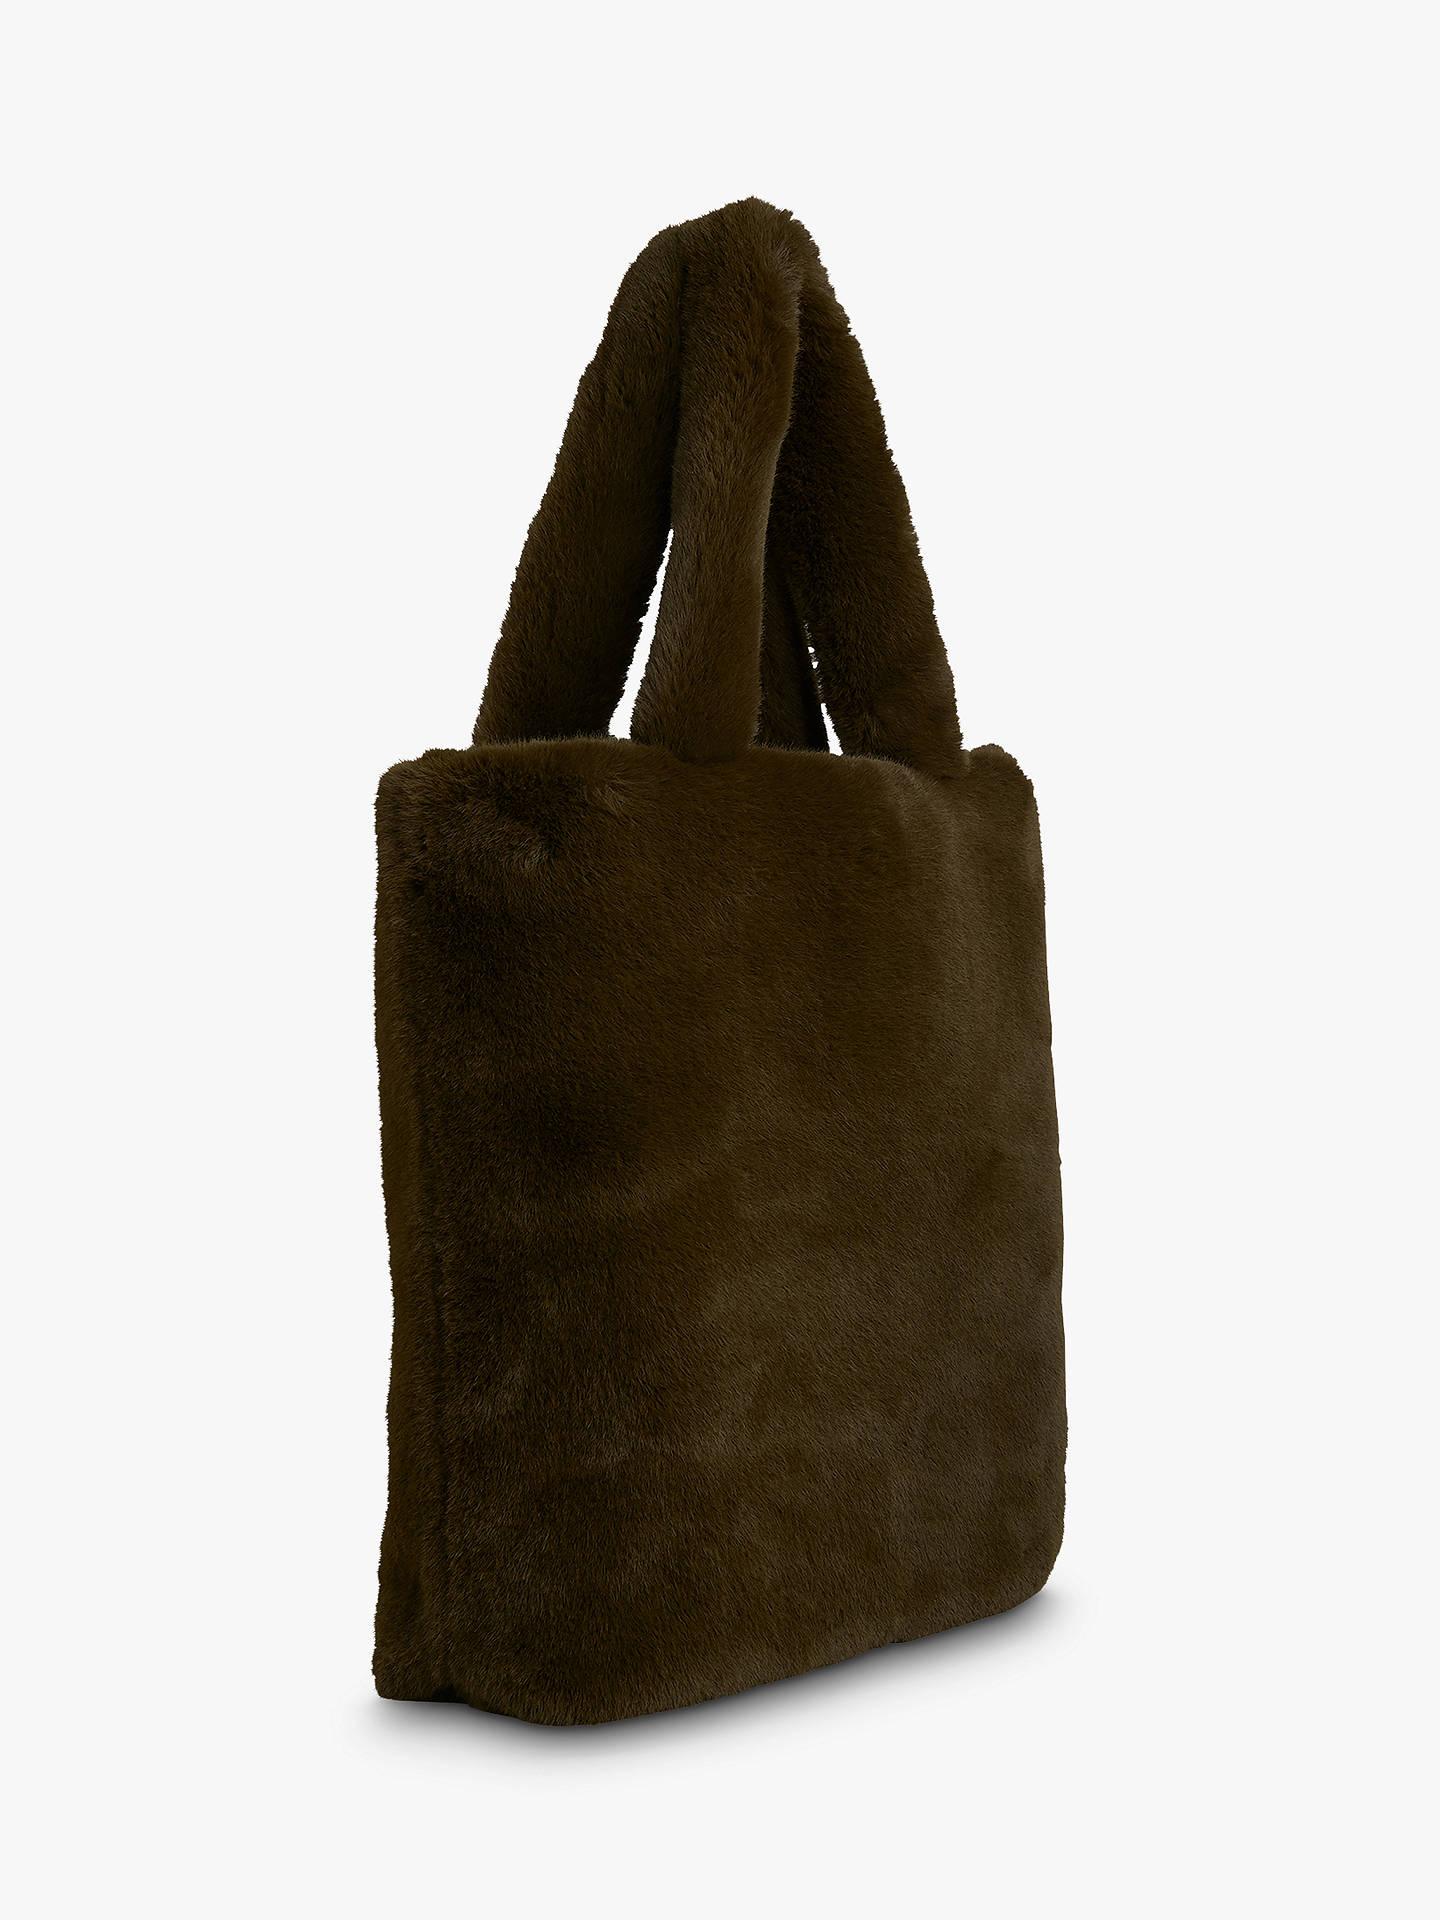 7c66bfb383 ... Buy Whistles Hattie Faux Fur Tote Bag